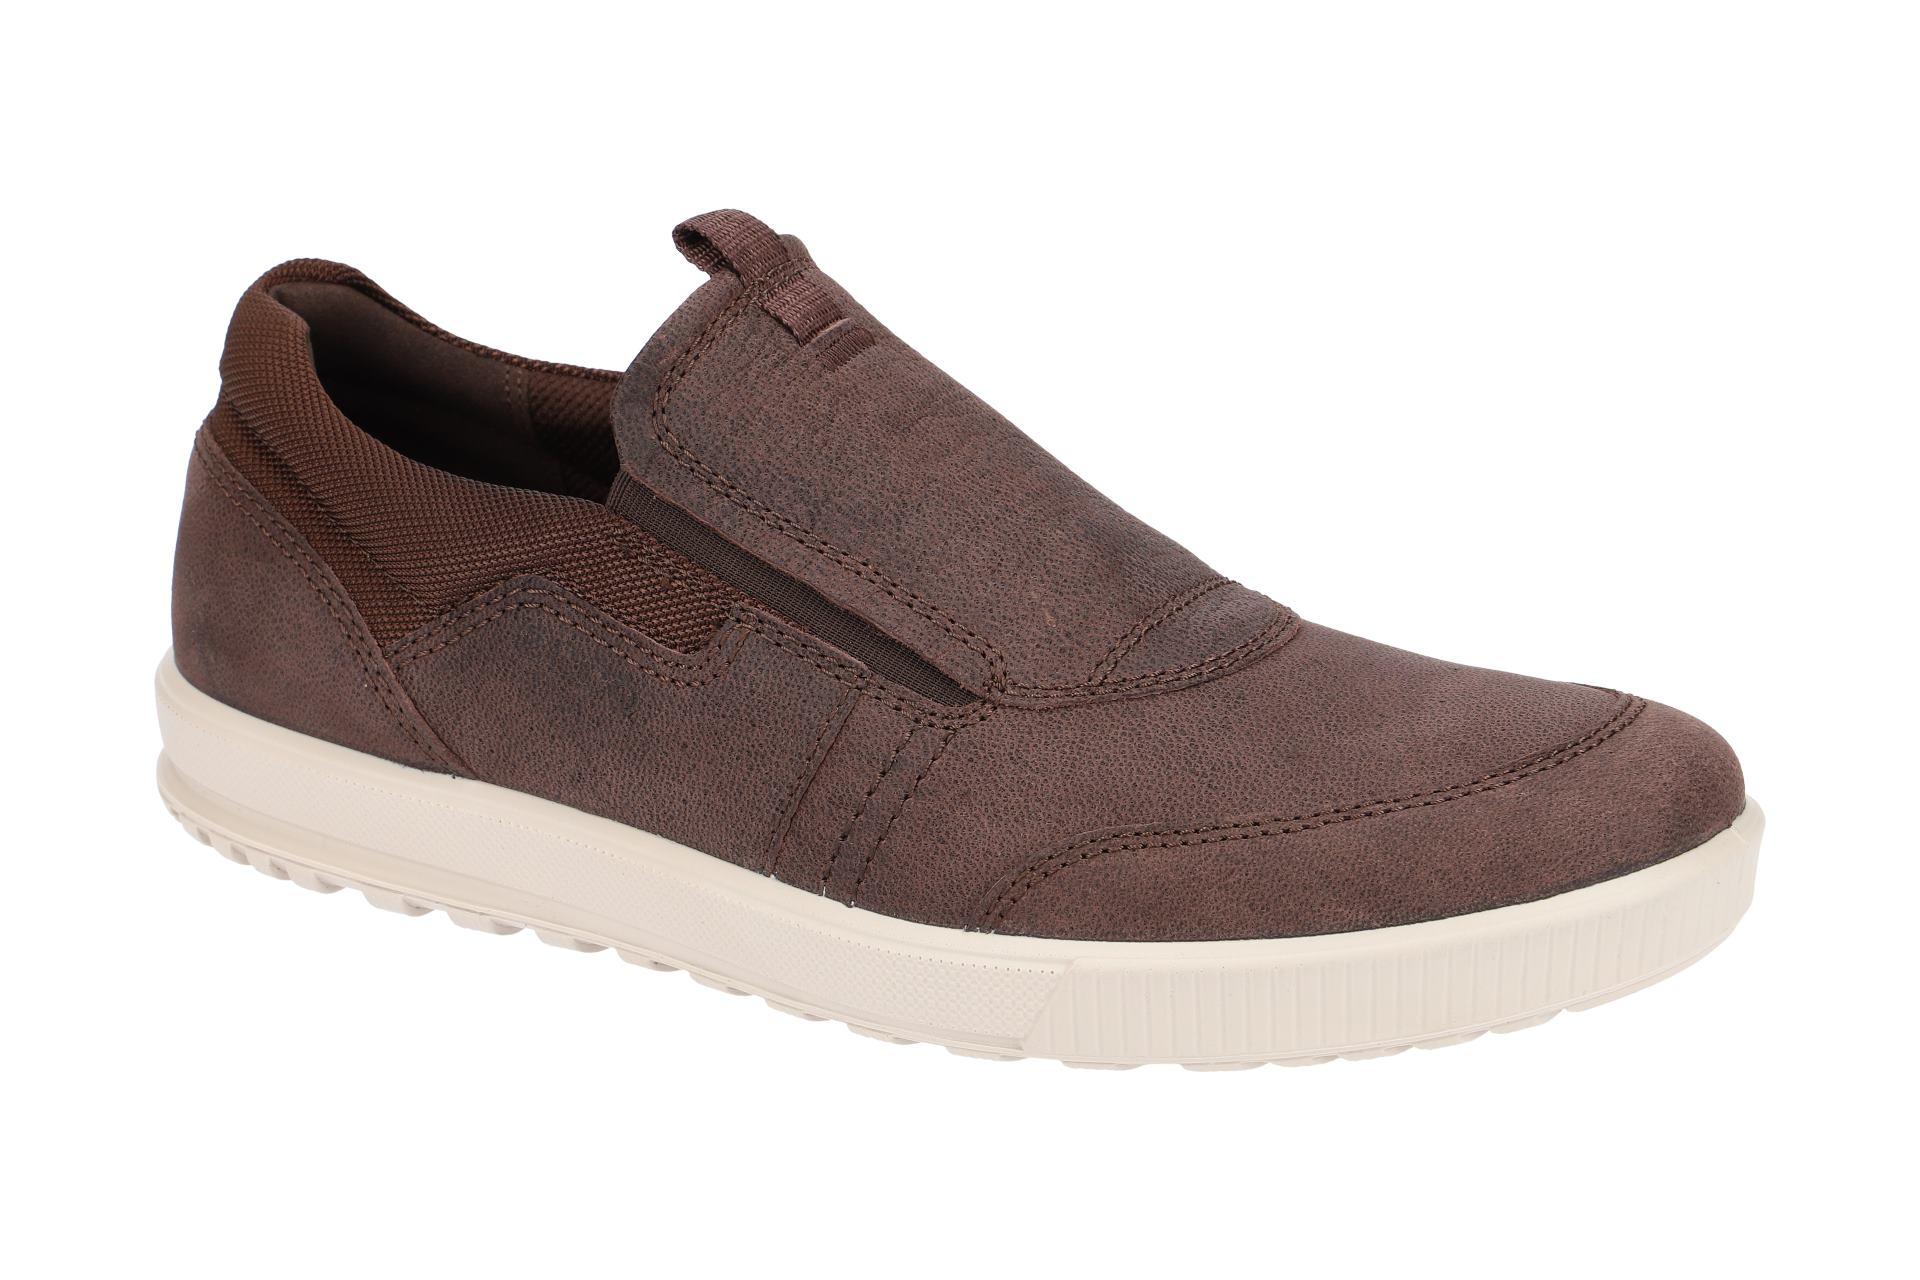 Ecco Schuhe ENNIO braun Herrenschuhe Slipper 53432402072 NEU